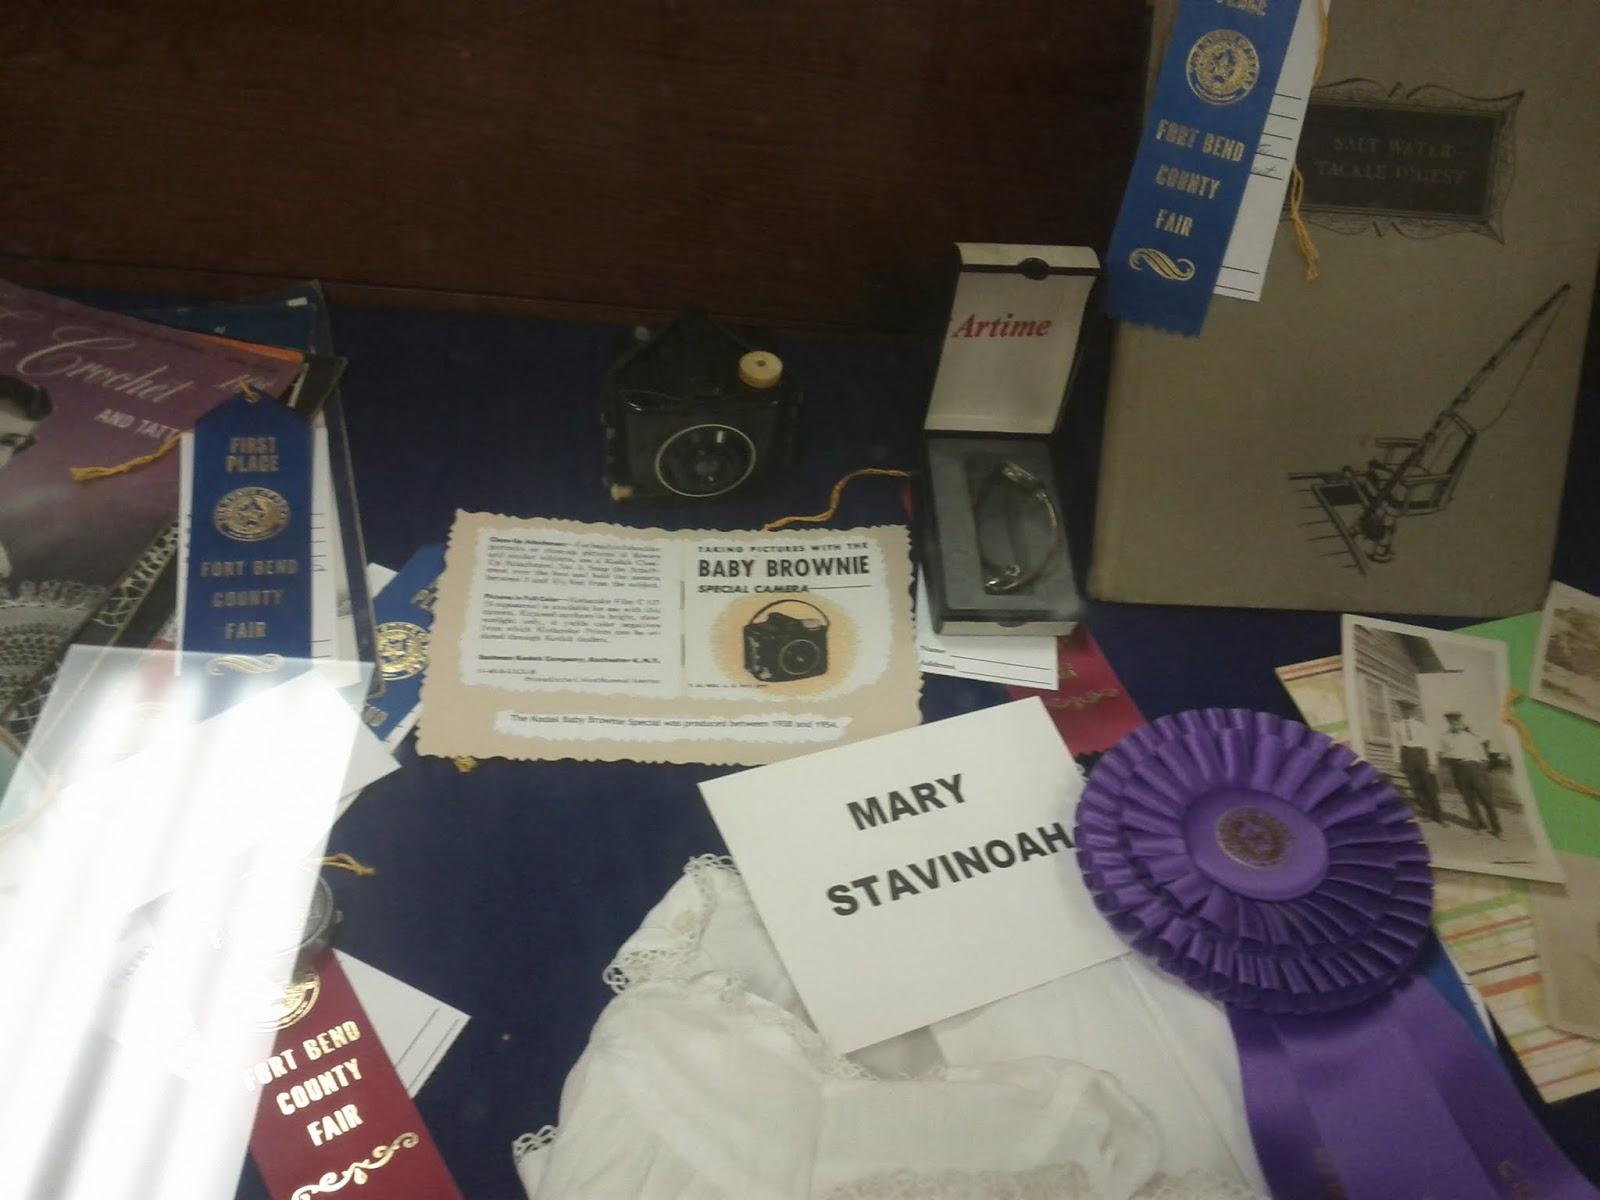 Fort Bend County Fair 2012 - IMG_20121006_193221.jpg